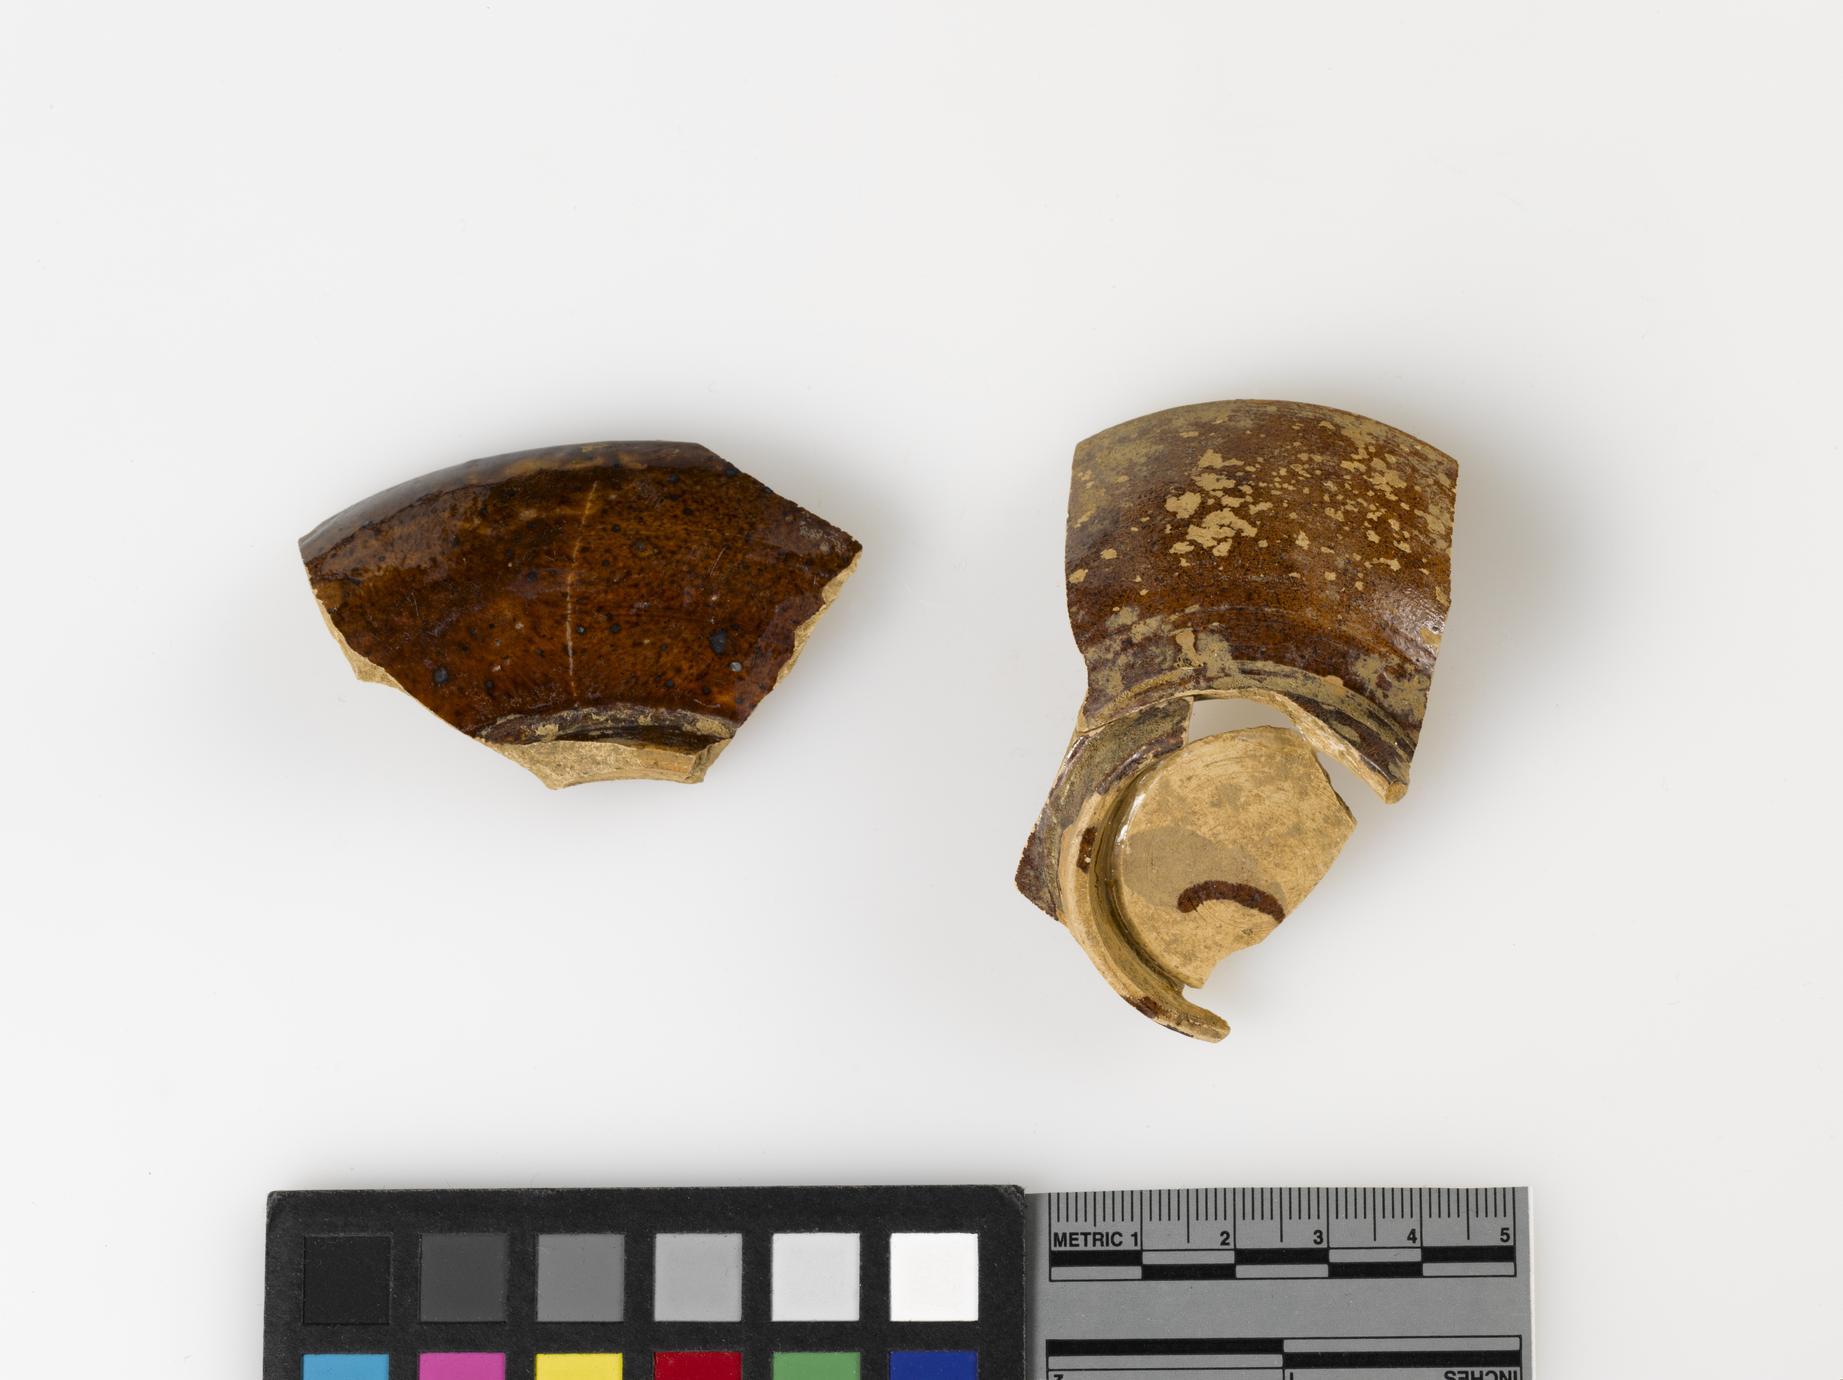 Tea bowl fragments (1 of 2)